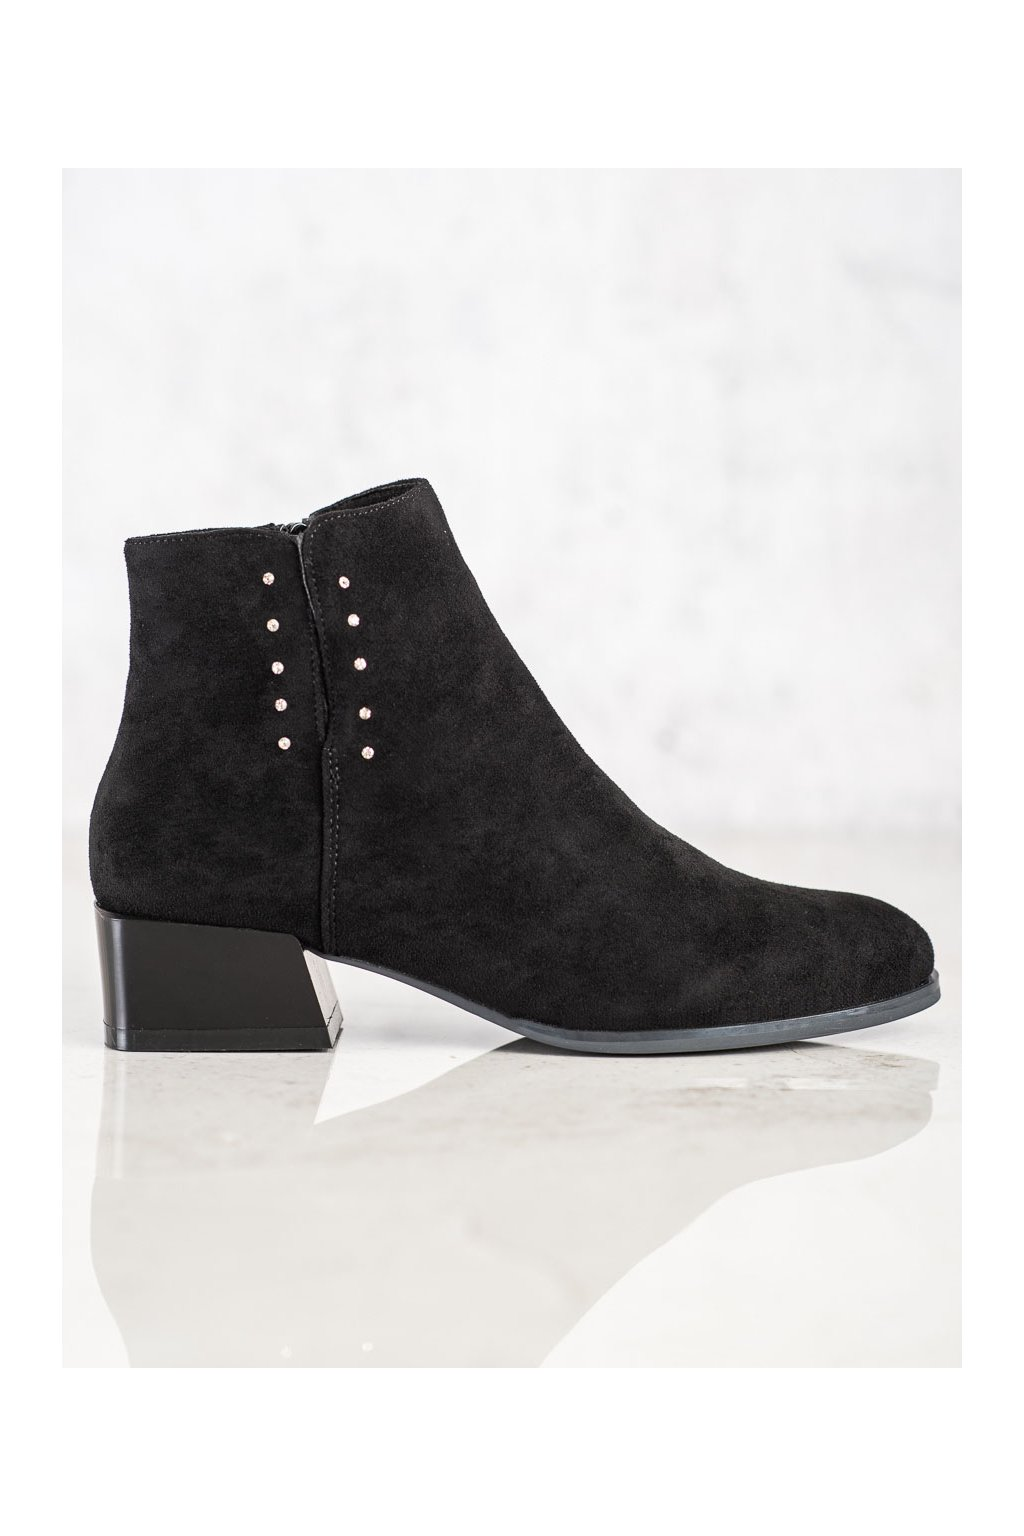 Čierne dámske topánky Sergio leone kod BT217B